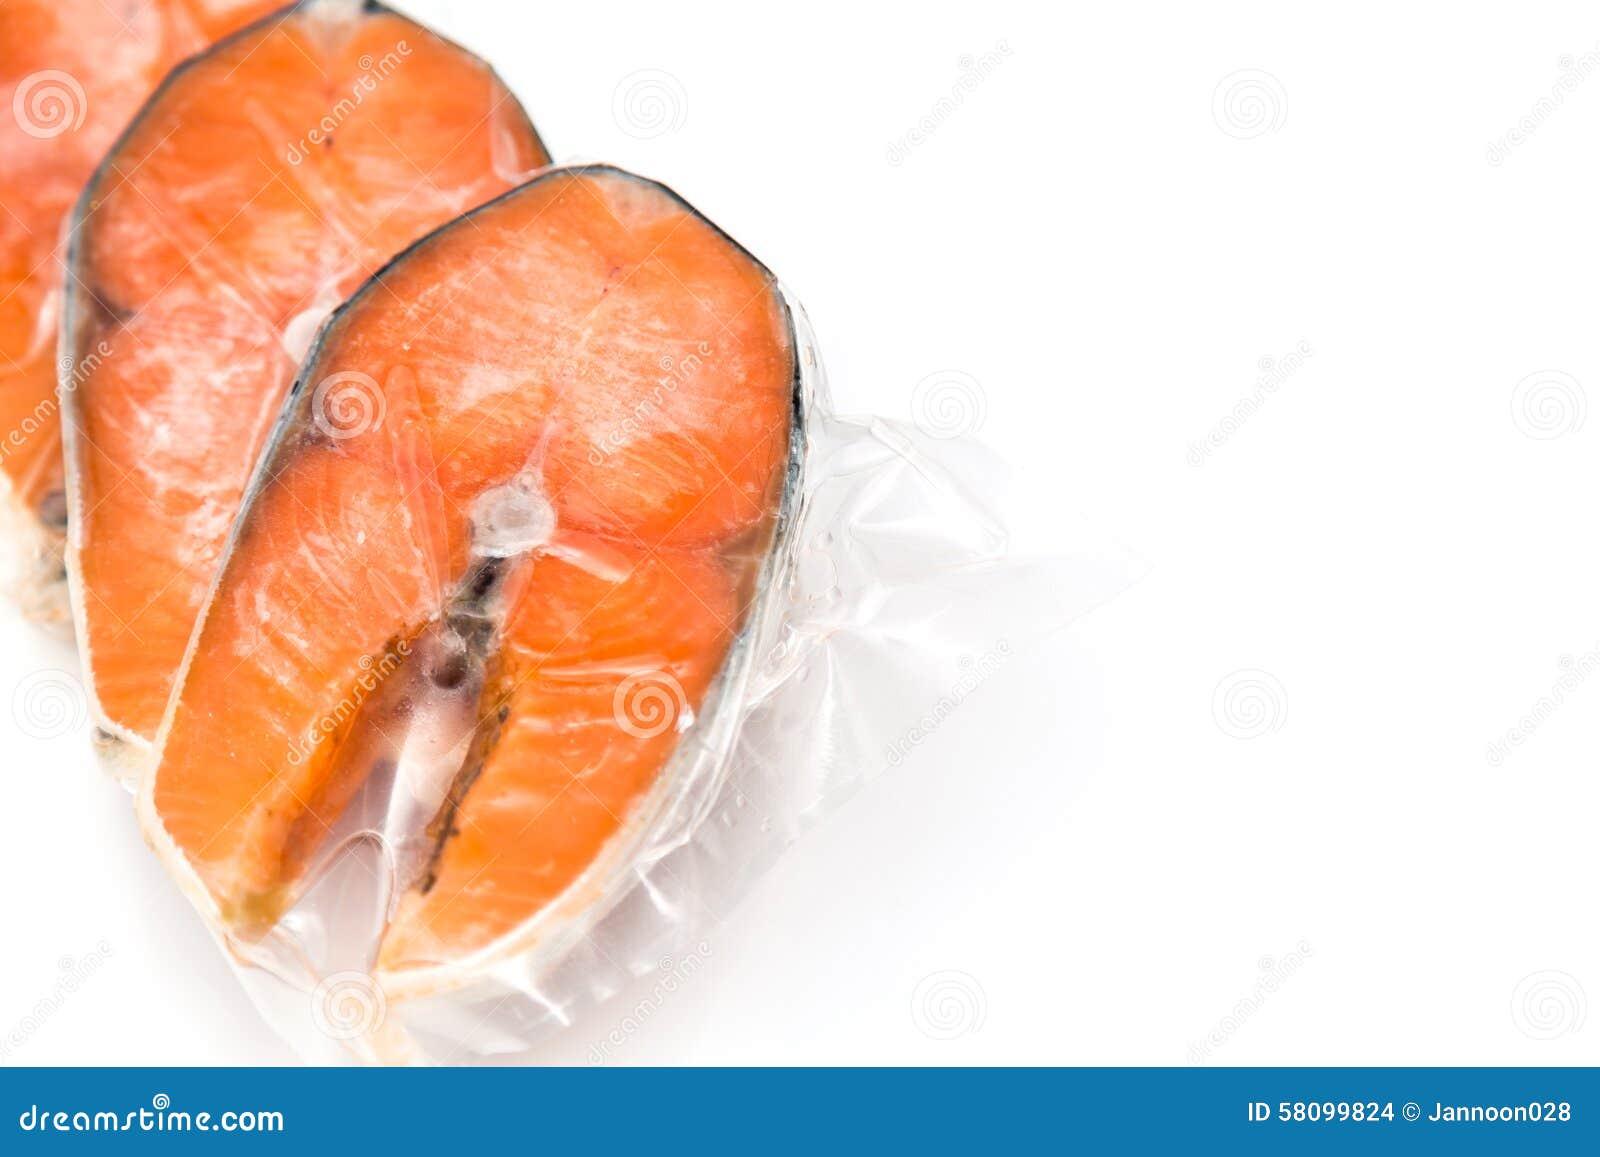 Faixas Salmon congeladas